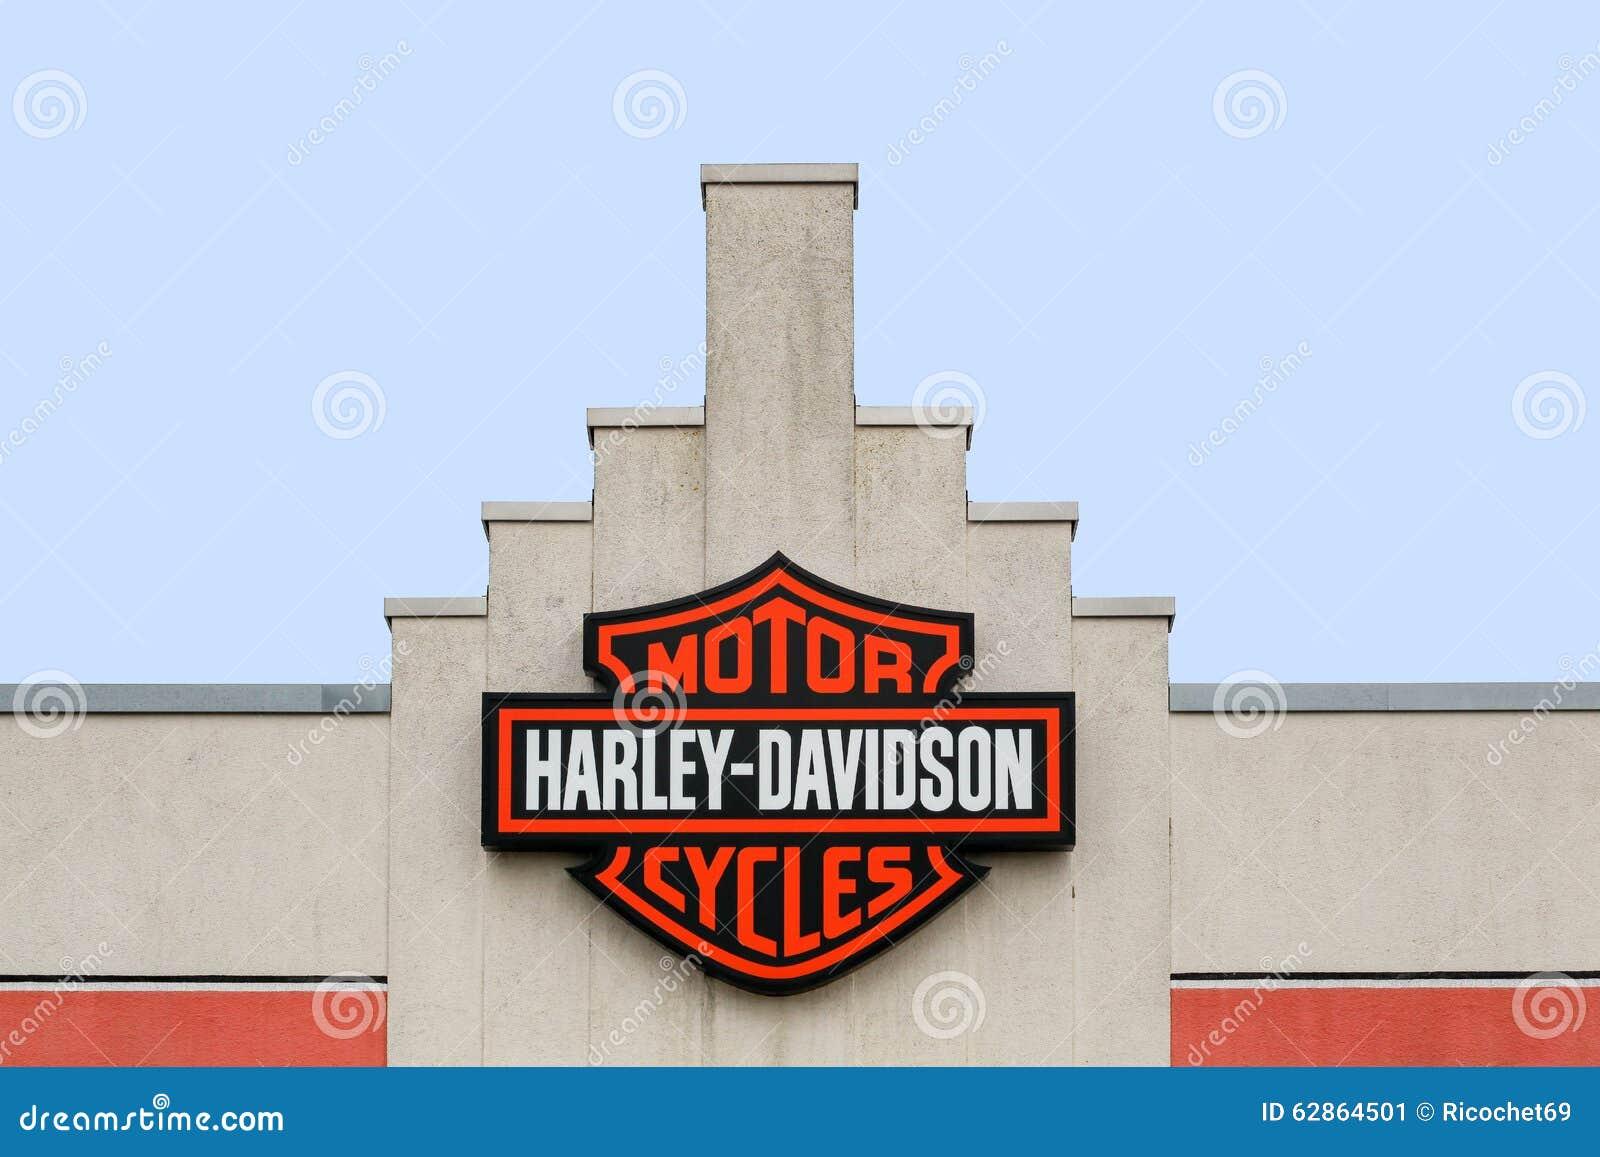 harley davidson logo on a store editorial photo image of. Black Bedroom Furniture Sets. Home Design Ideas